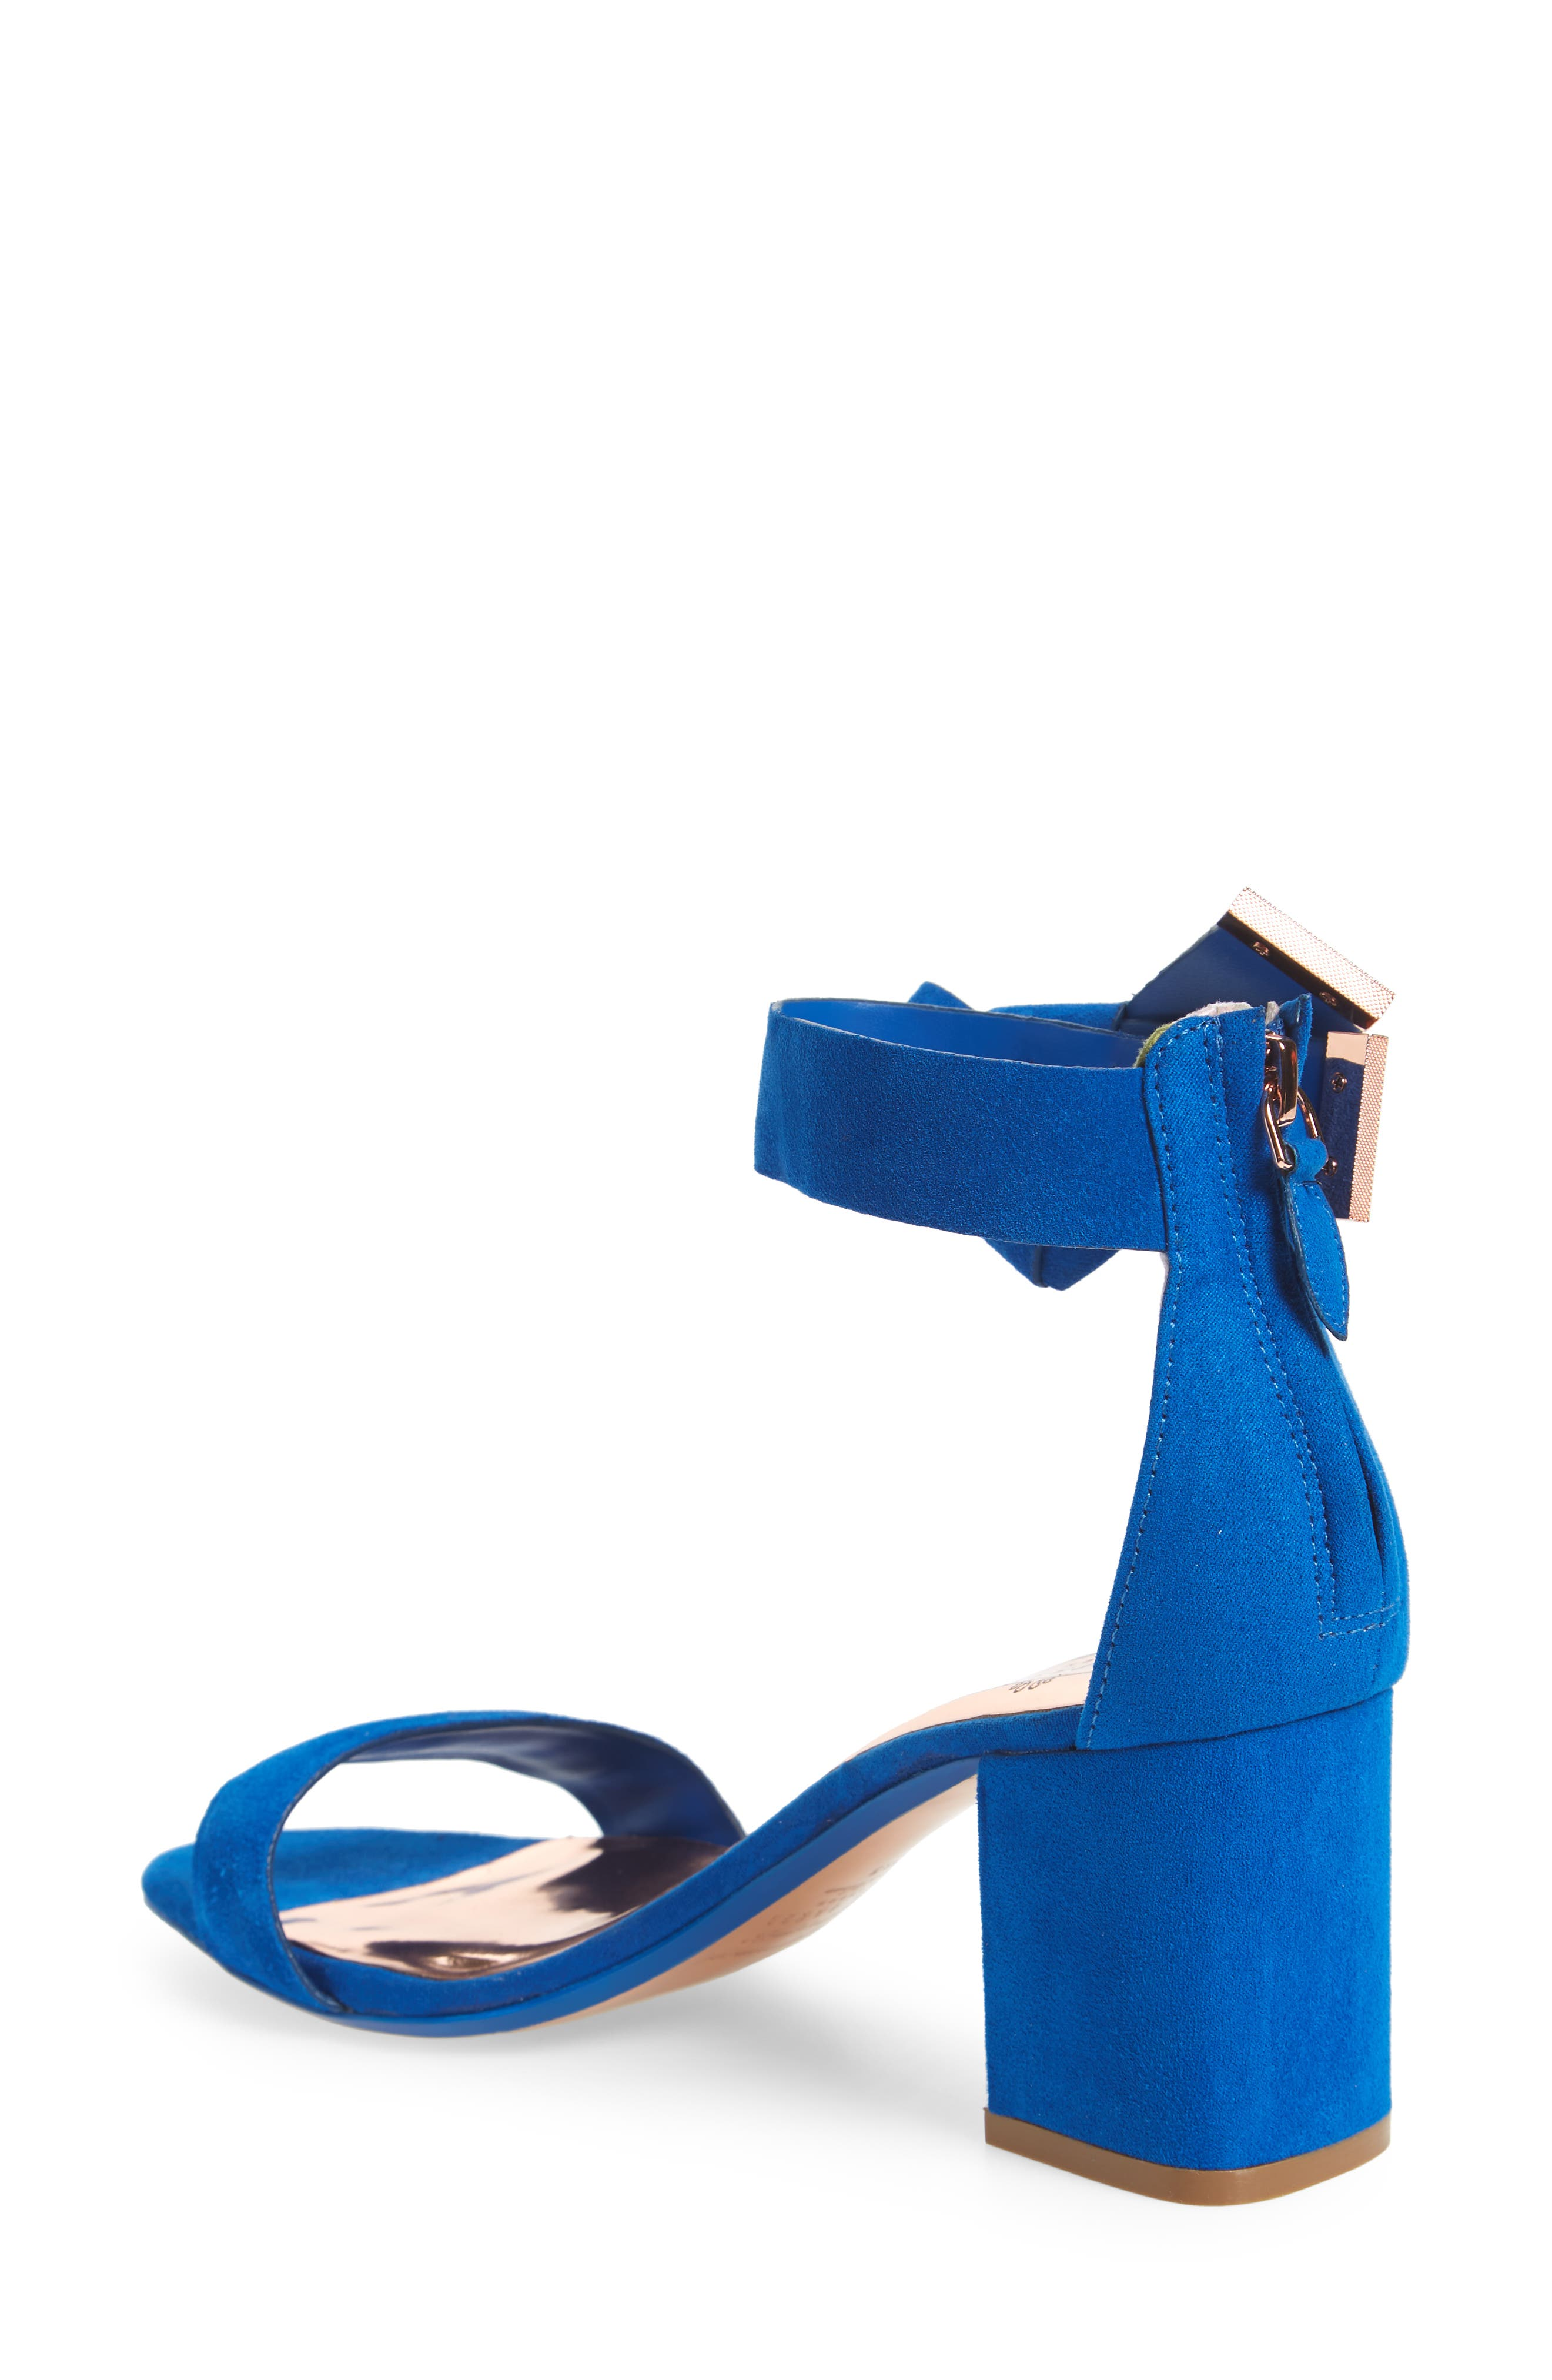 Kerrias Block Heel Sandal,                             Alternate thumbnail 2, color,                             Blue Suede